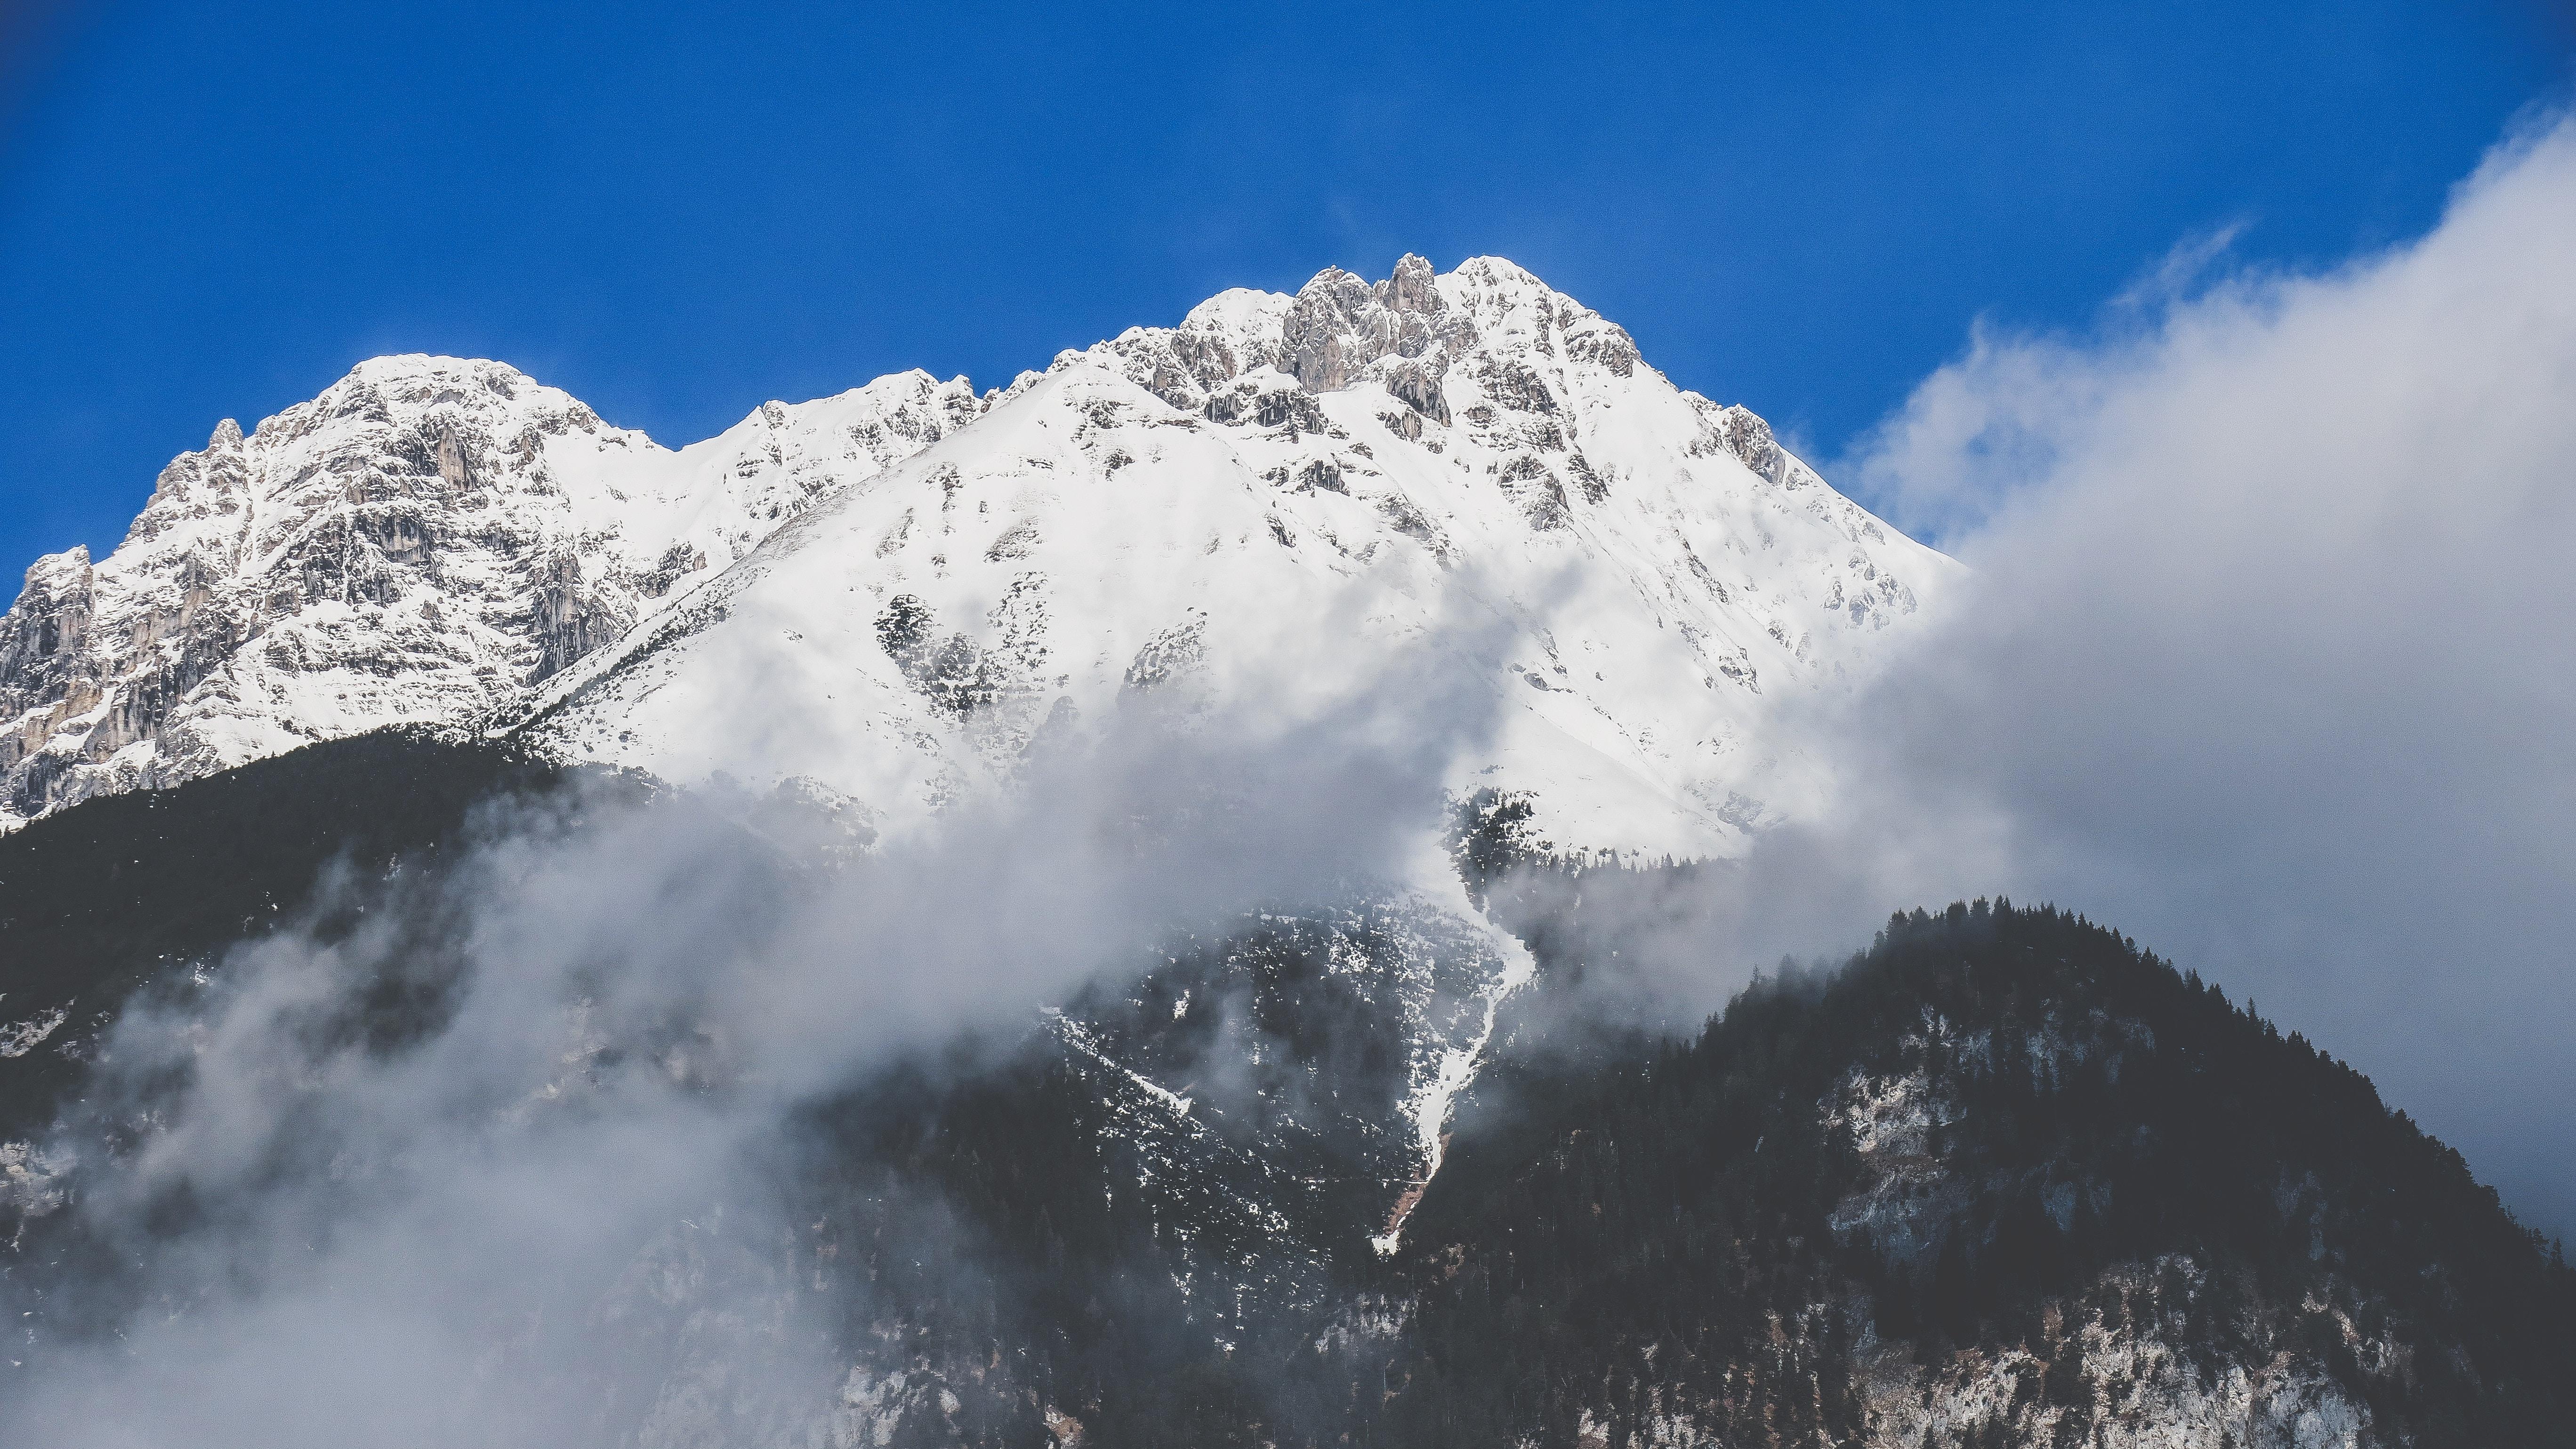 A sharp cloud-shrouded peak against a blue sky in Innsbruck